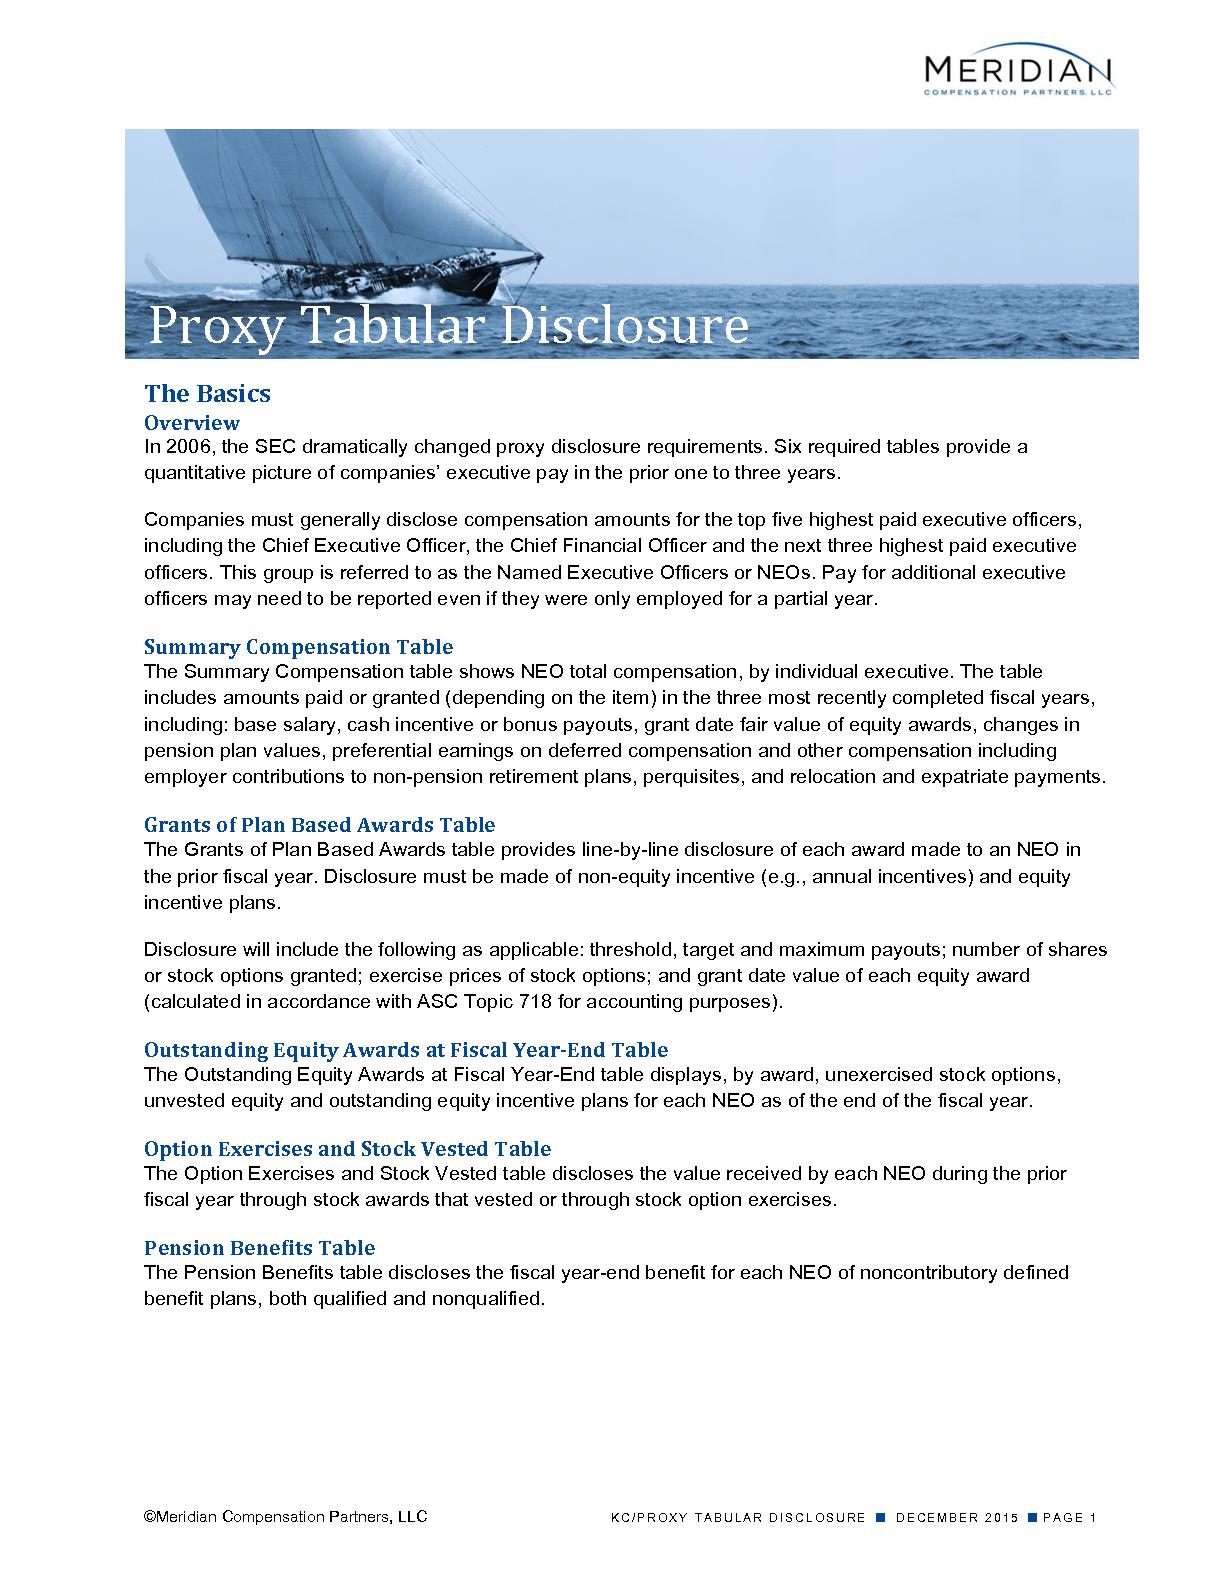 Proxy Tabular Disclosure (PDF)